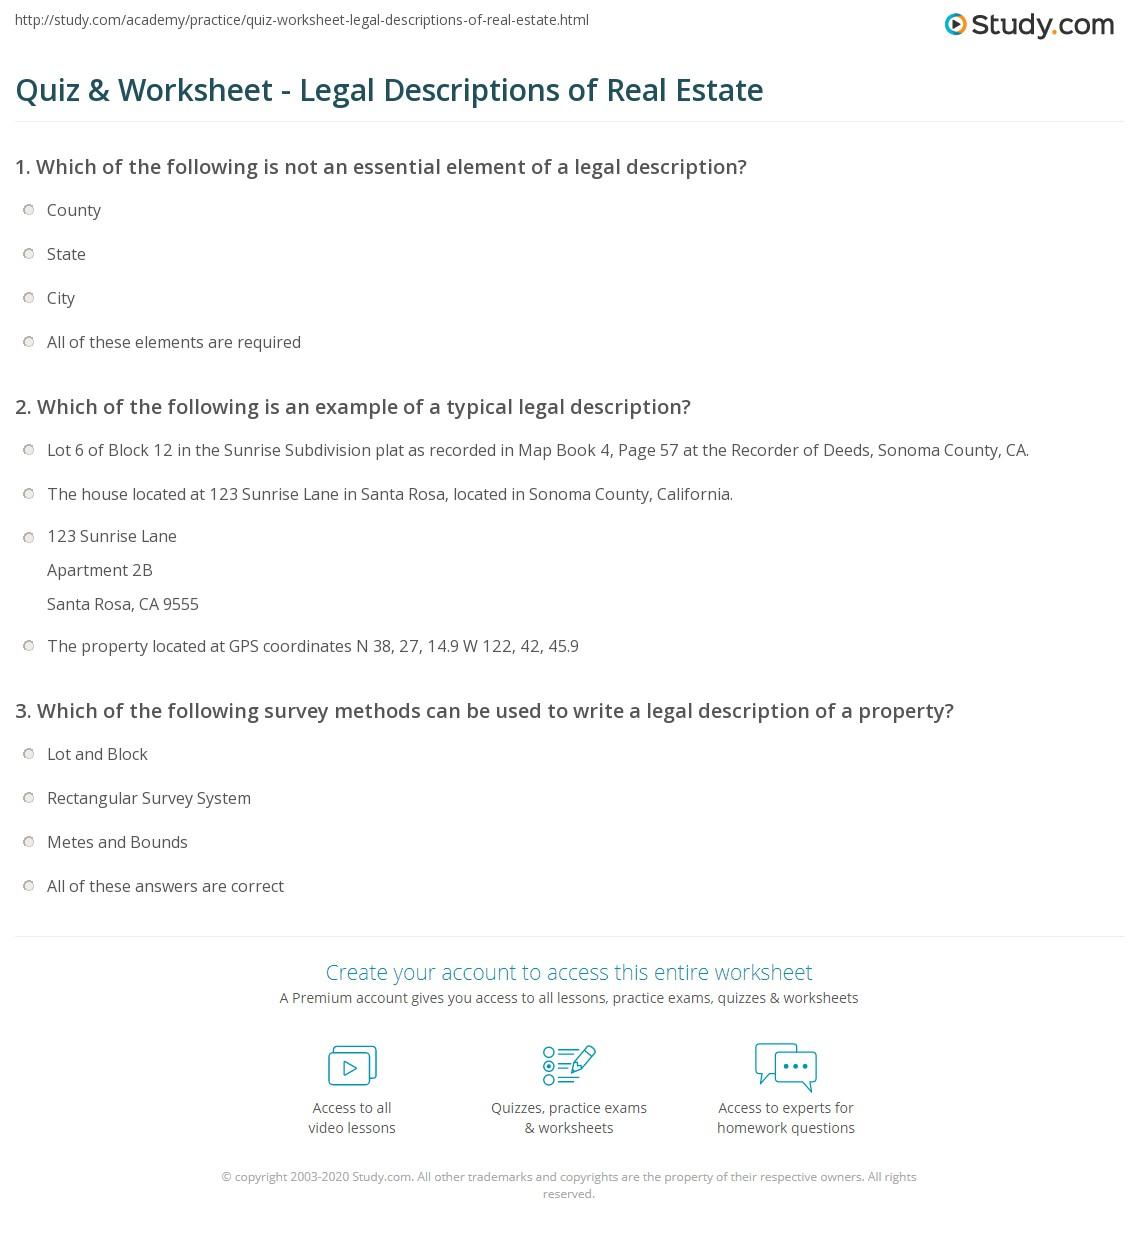 How do I find a property's legal description?